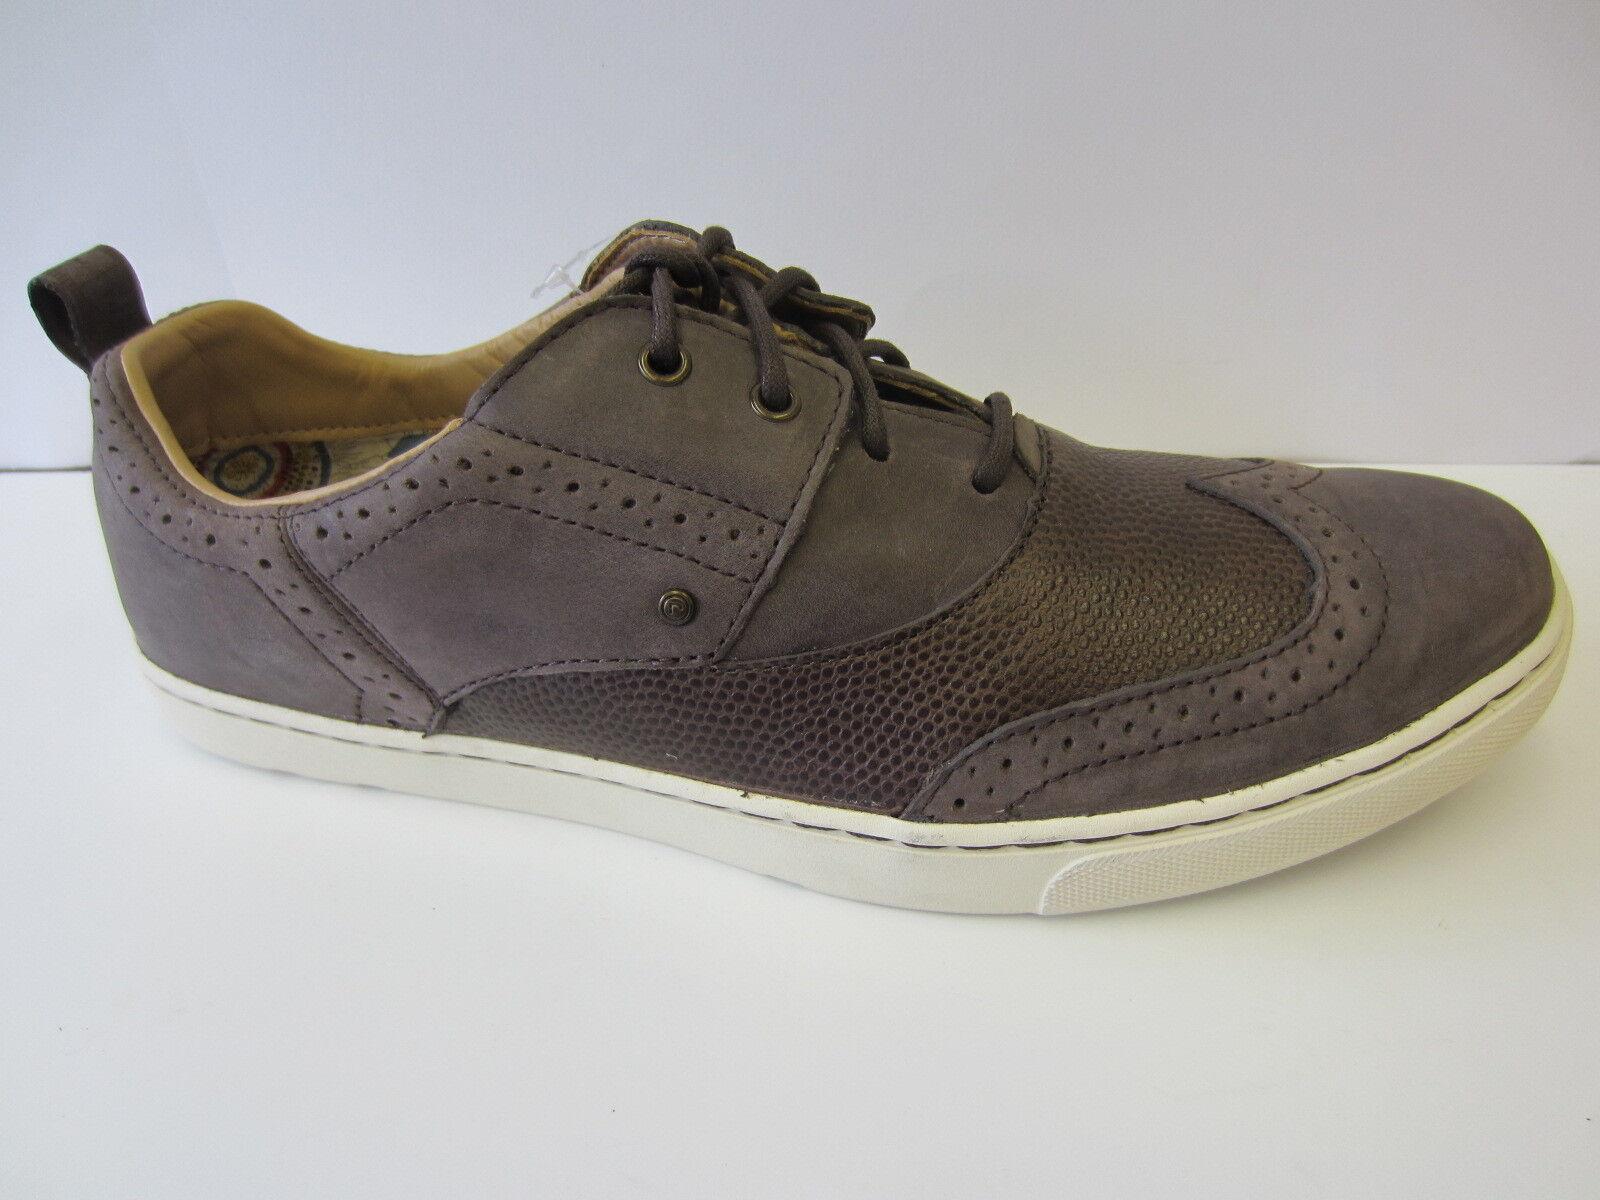 Cordón Hombre de Cuero Marrón para Hombre Cordón Zapatos de Ocio K58295 3a8b28